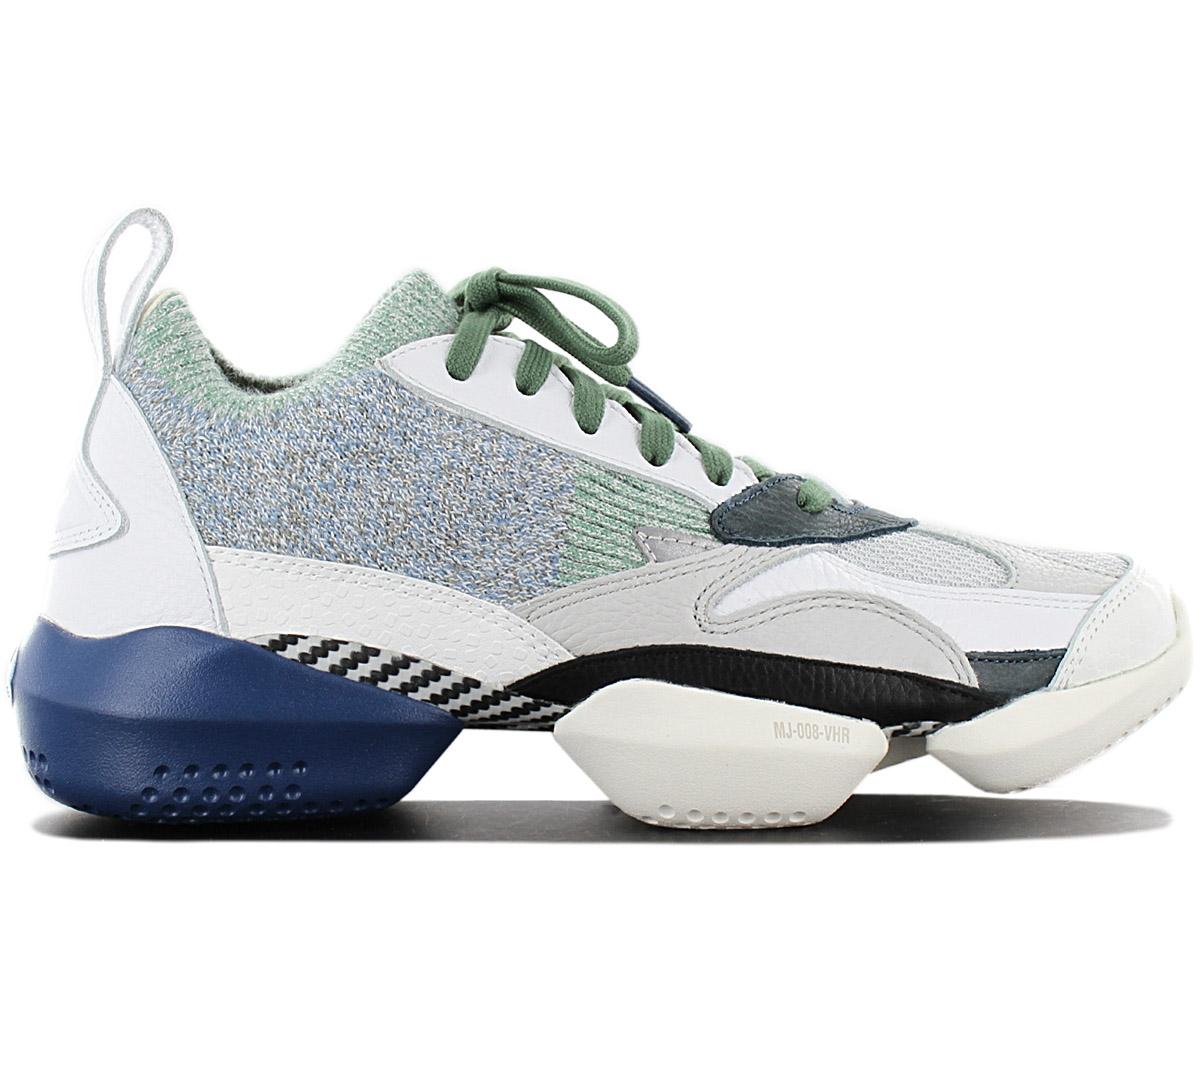 Details about Reebok 3D Op. Fractional Men's High Tech Sneaker CN5478 Shoes Sneakers New